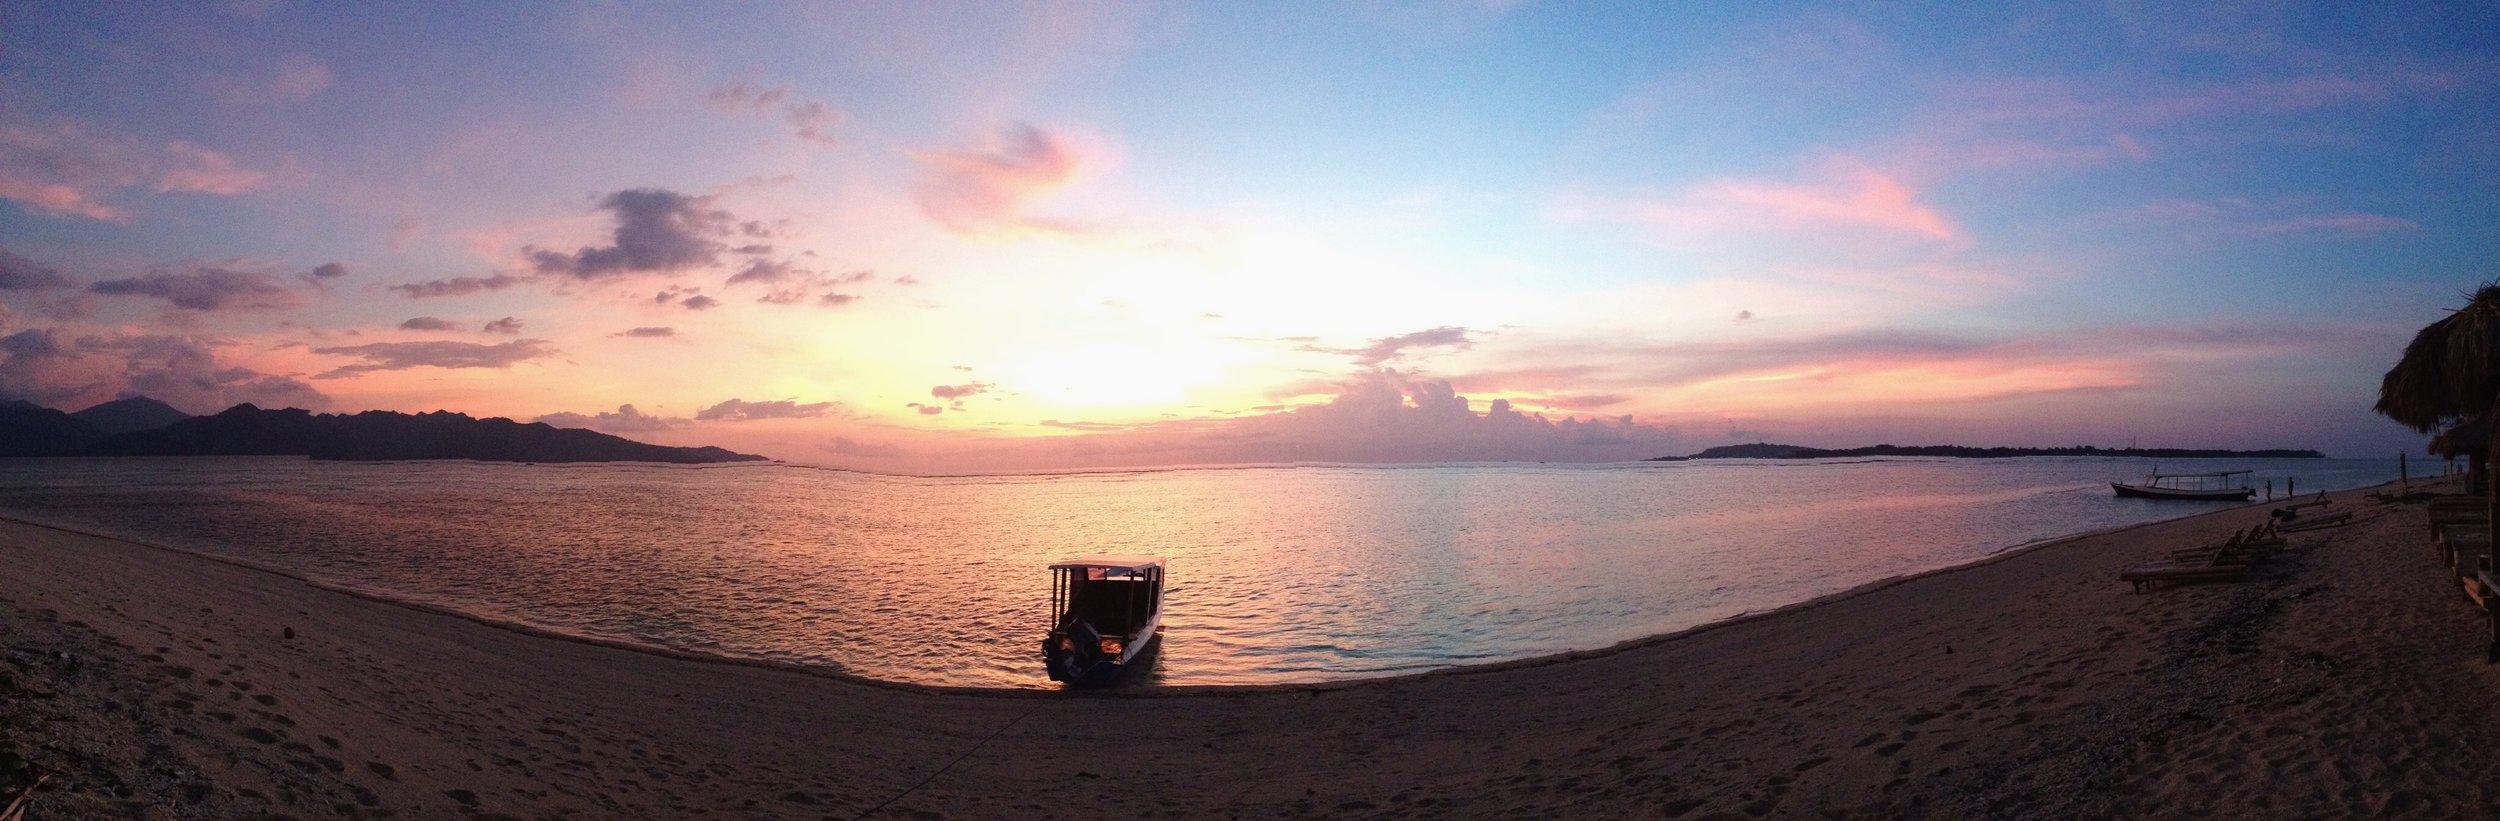 Gili-air-sunset.jpg